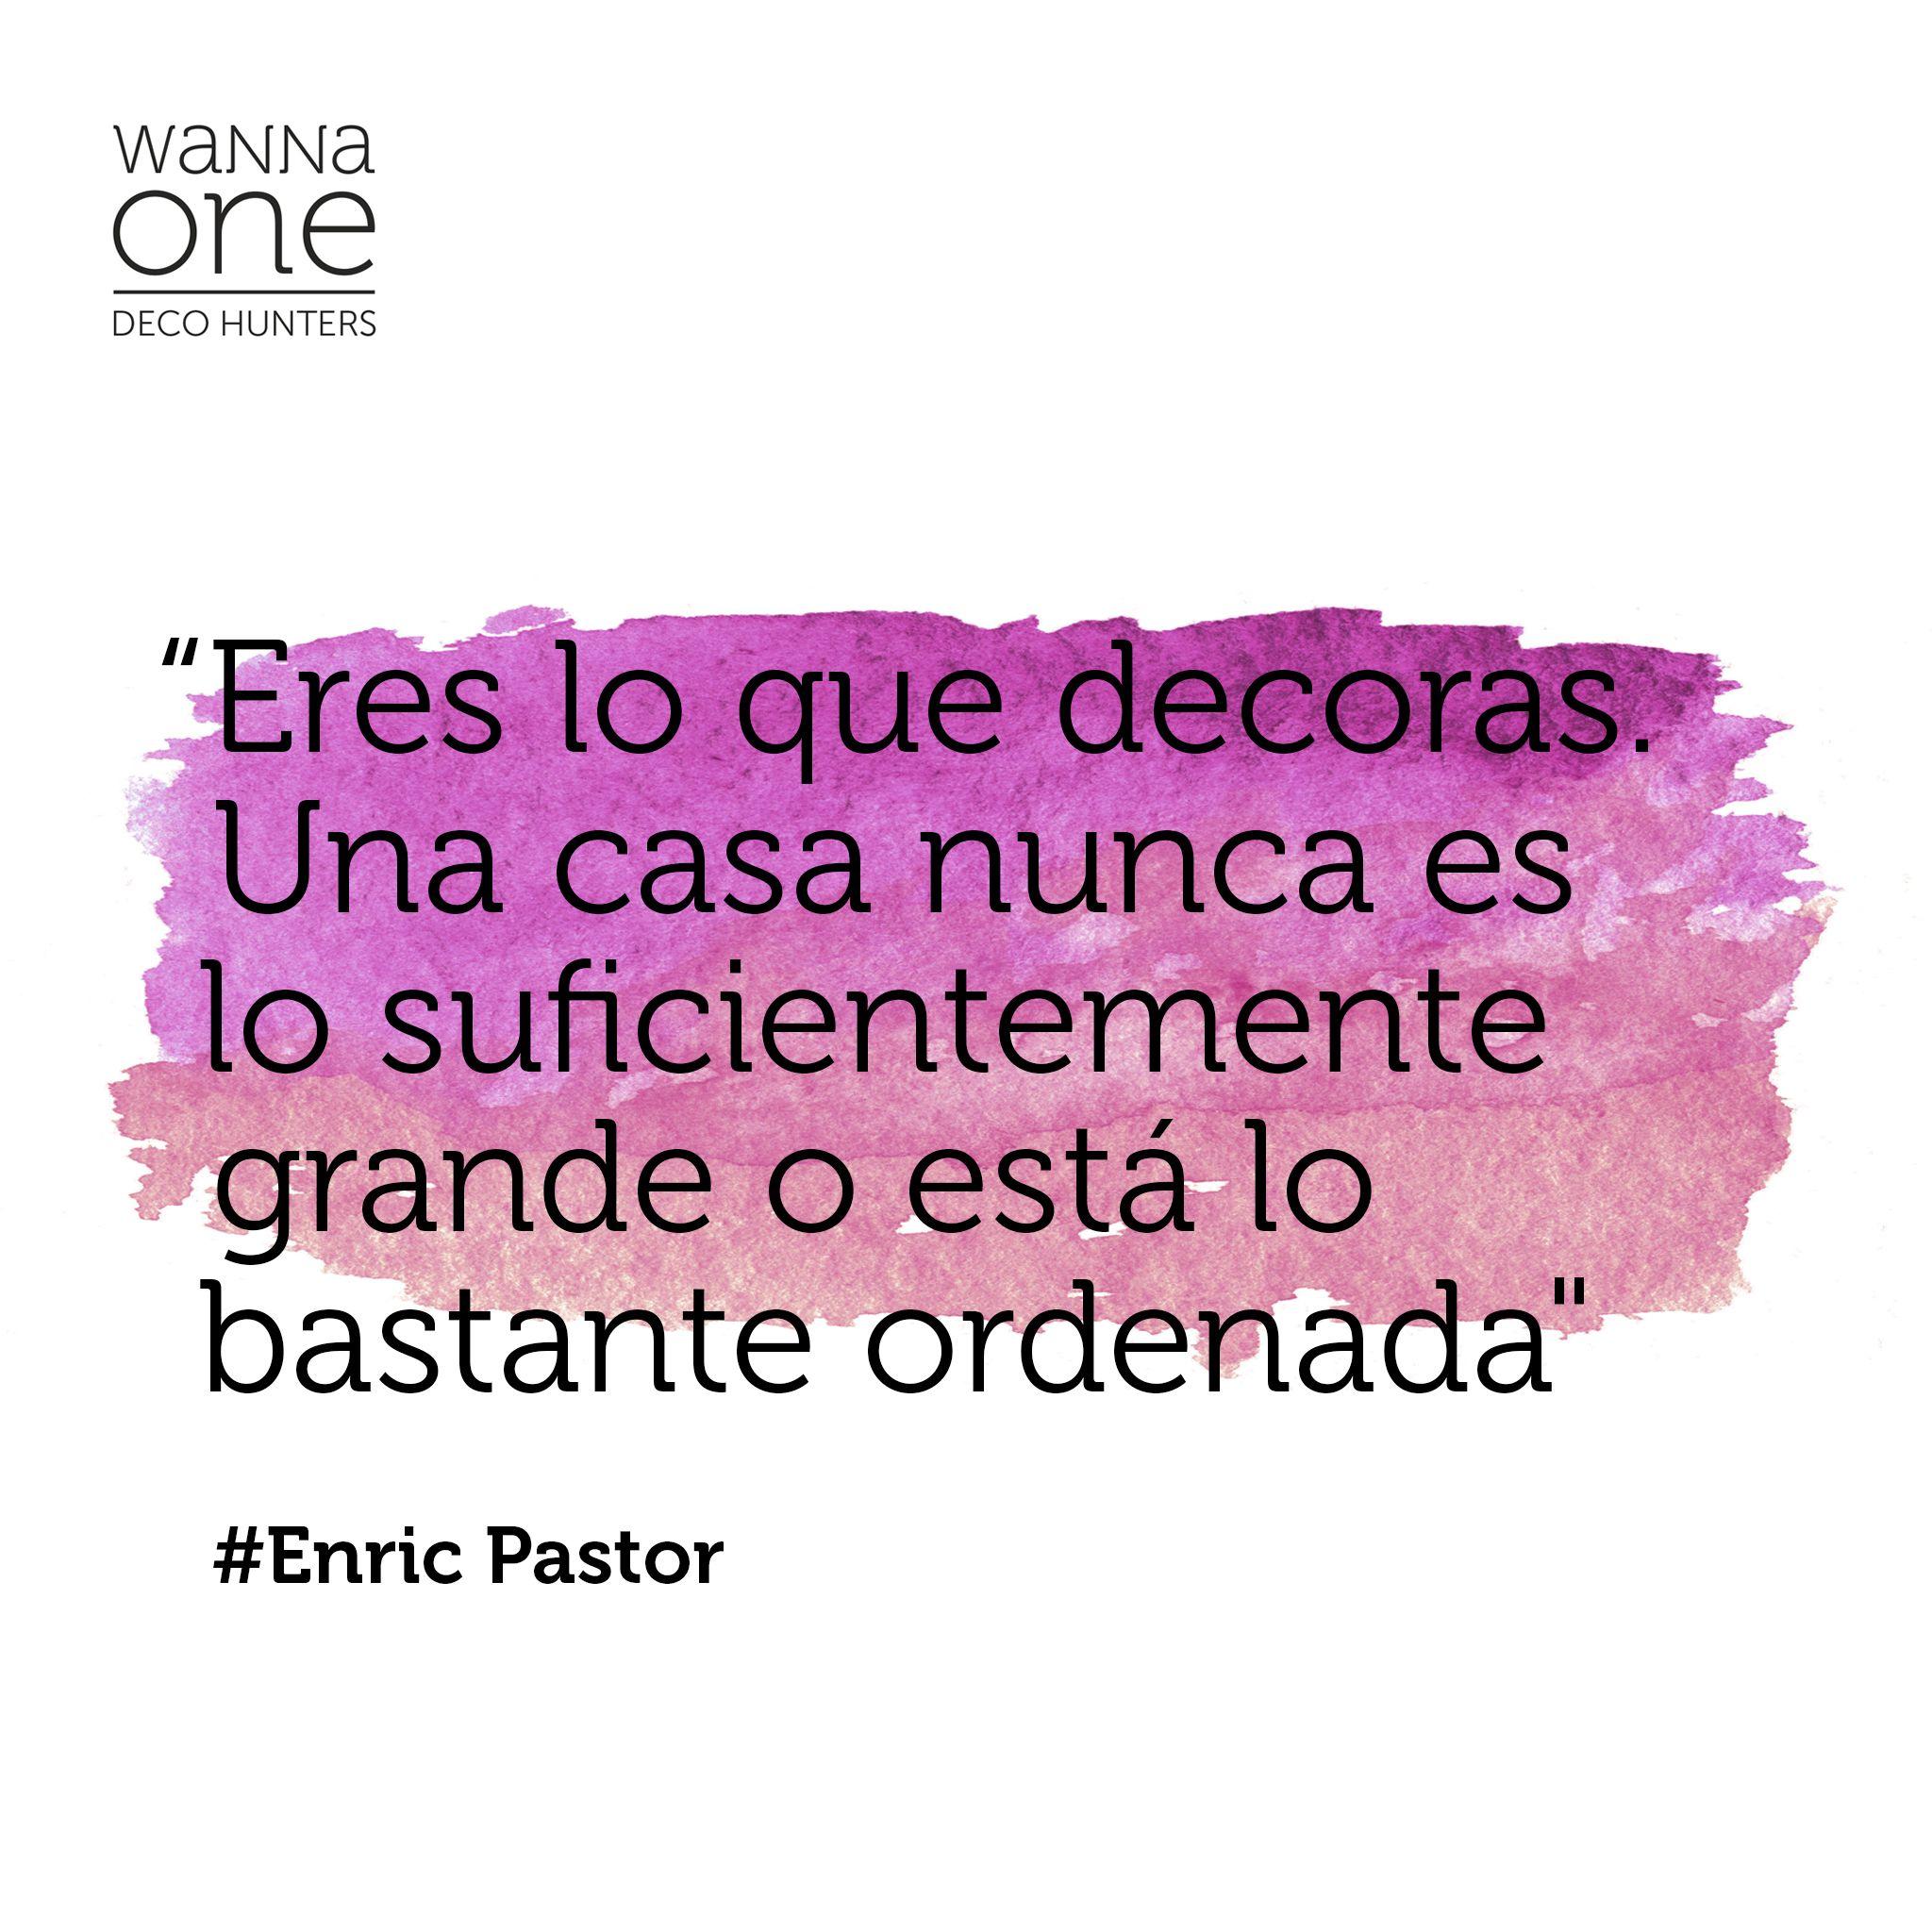 FRASE DECO DE LA SEMANA #Casa #ADEspaña #EnricPastor